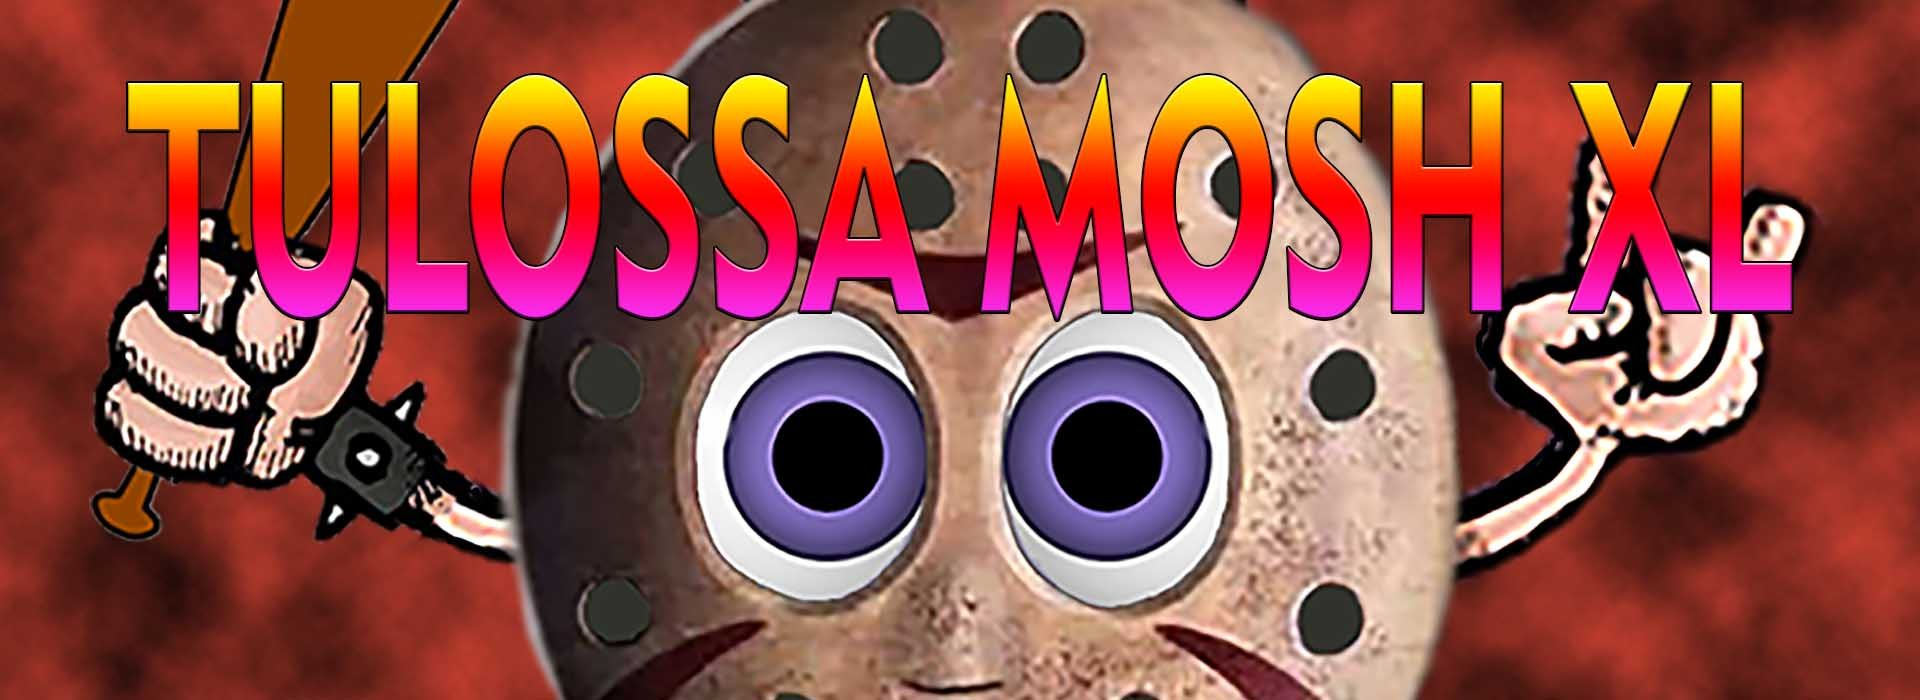 MOSHXL-MAINOS-1920x700.jpg